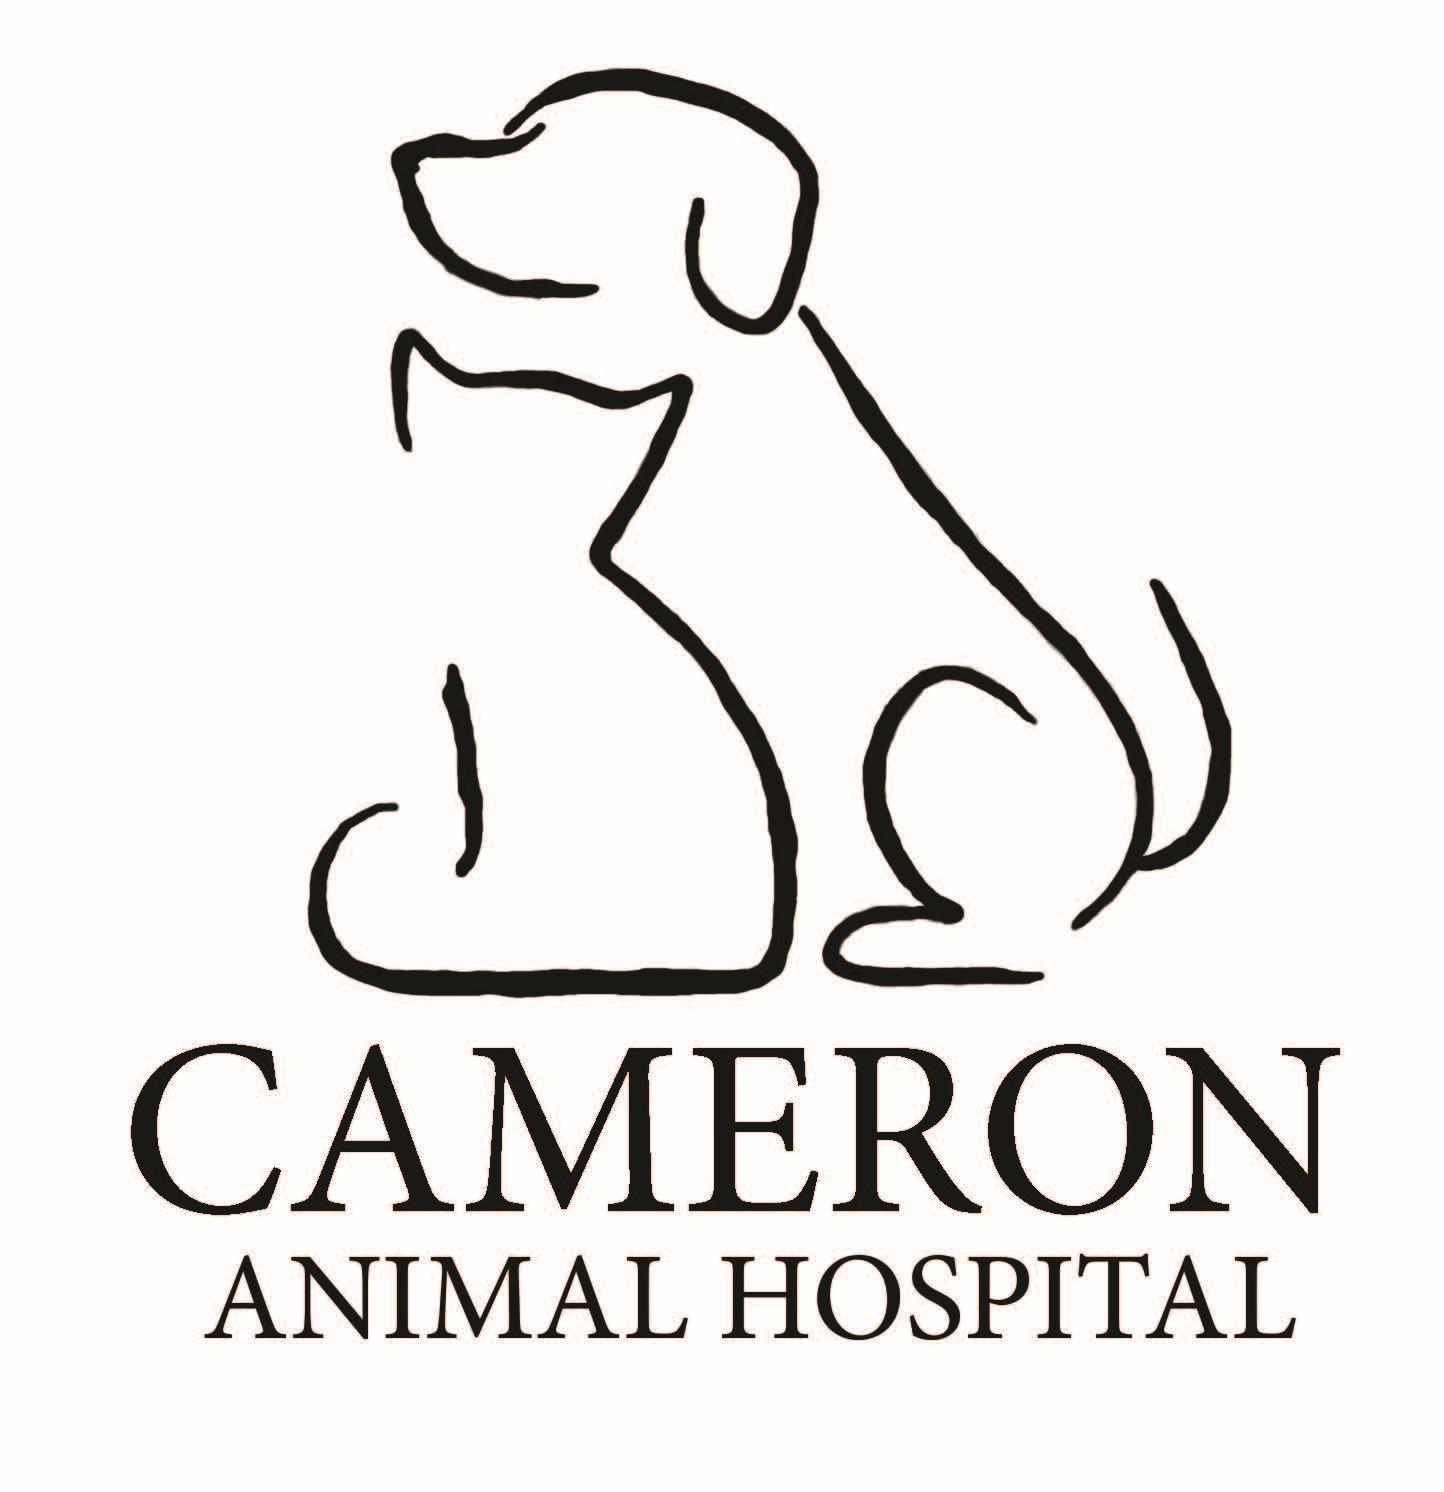 Cameron Animal Hospital (not a shelter)